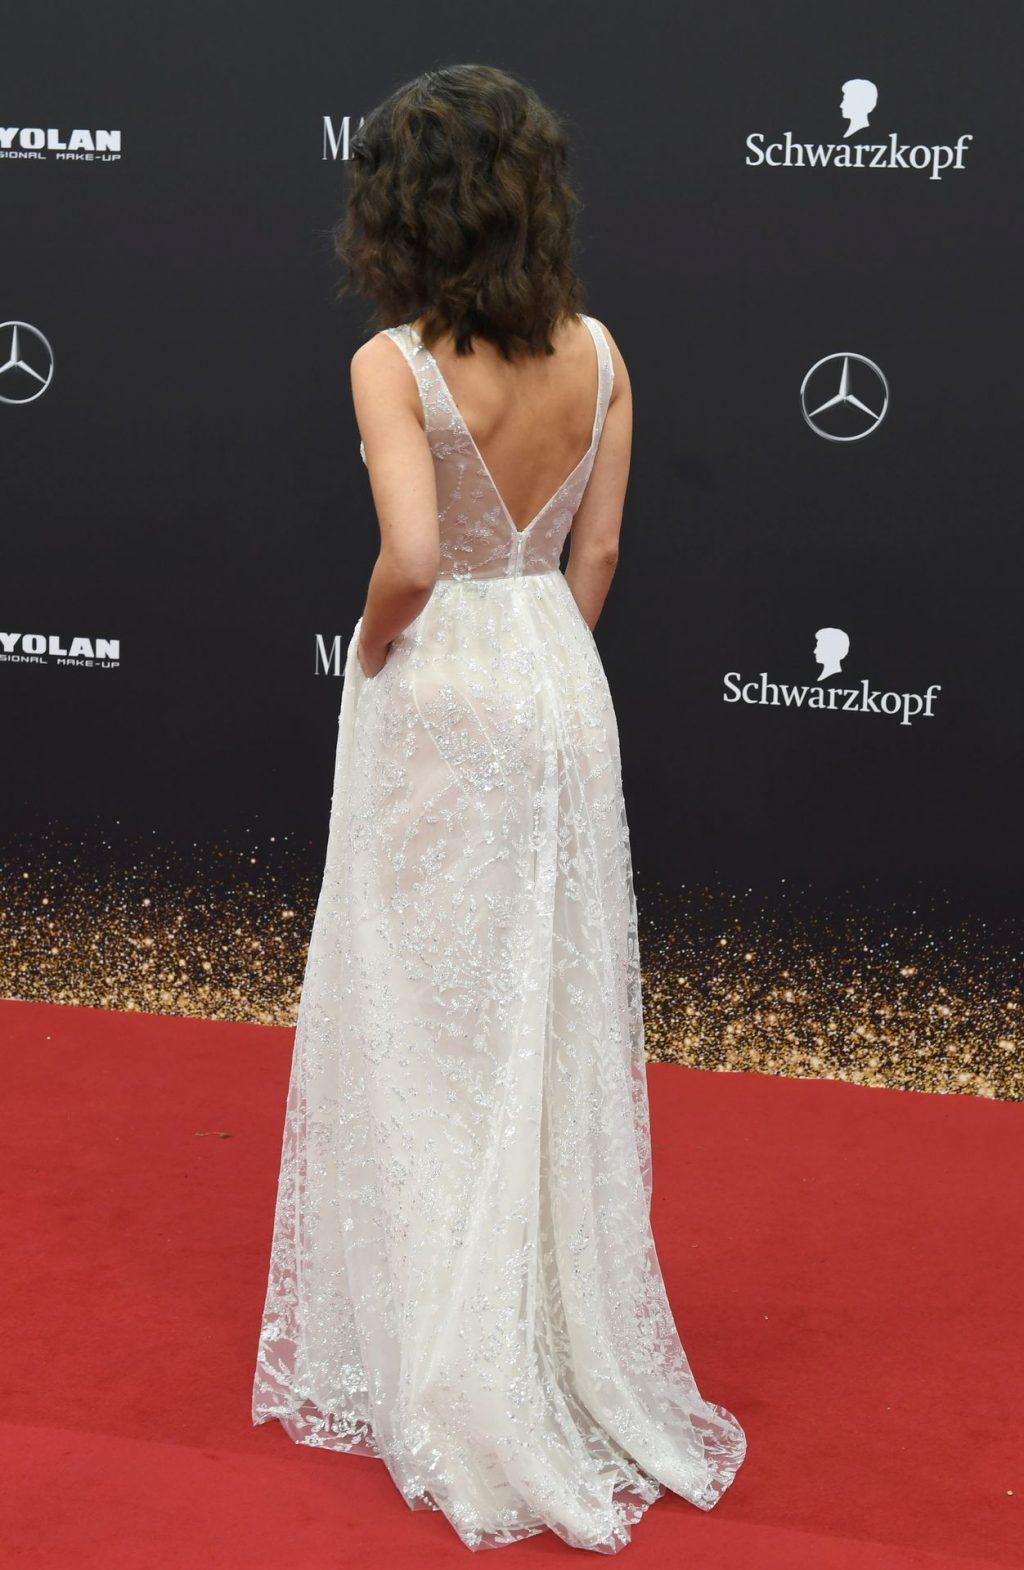 Lena Meyer-Landrut Sexy (33 Photos + Video)